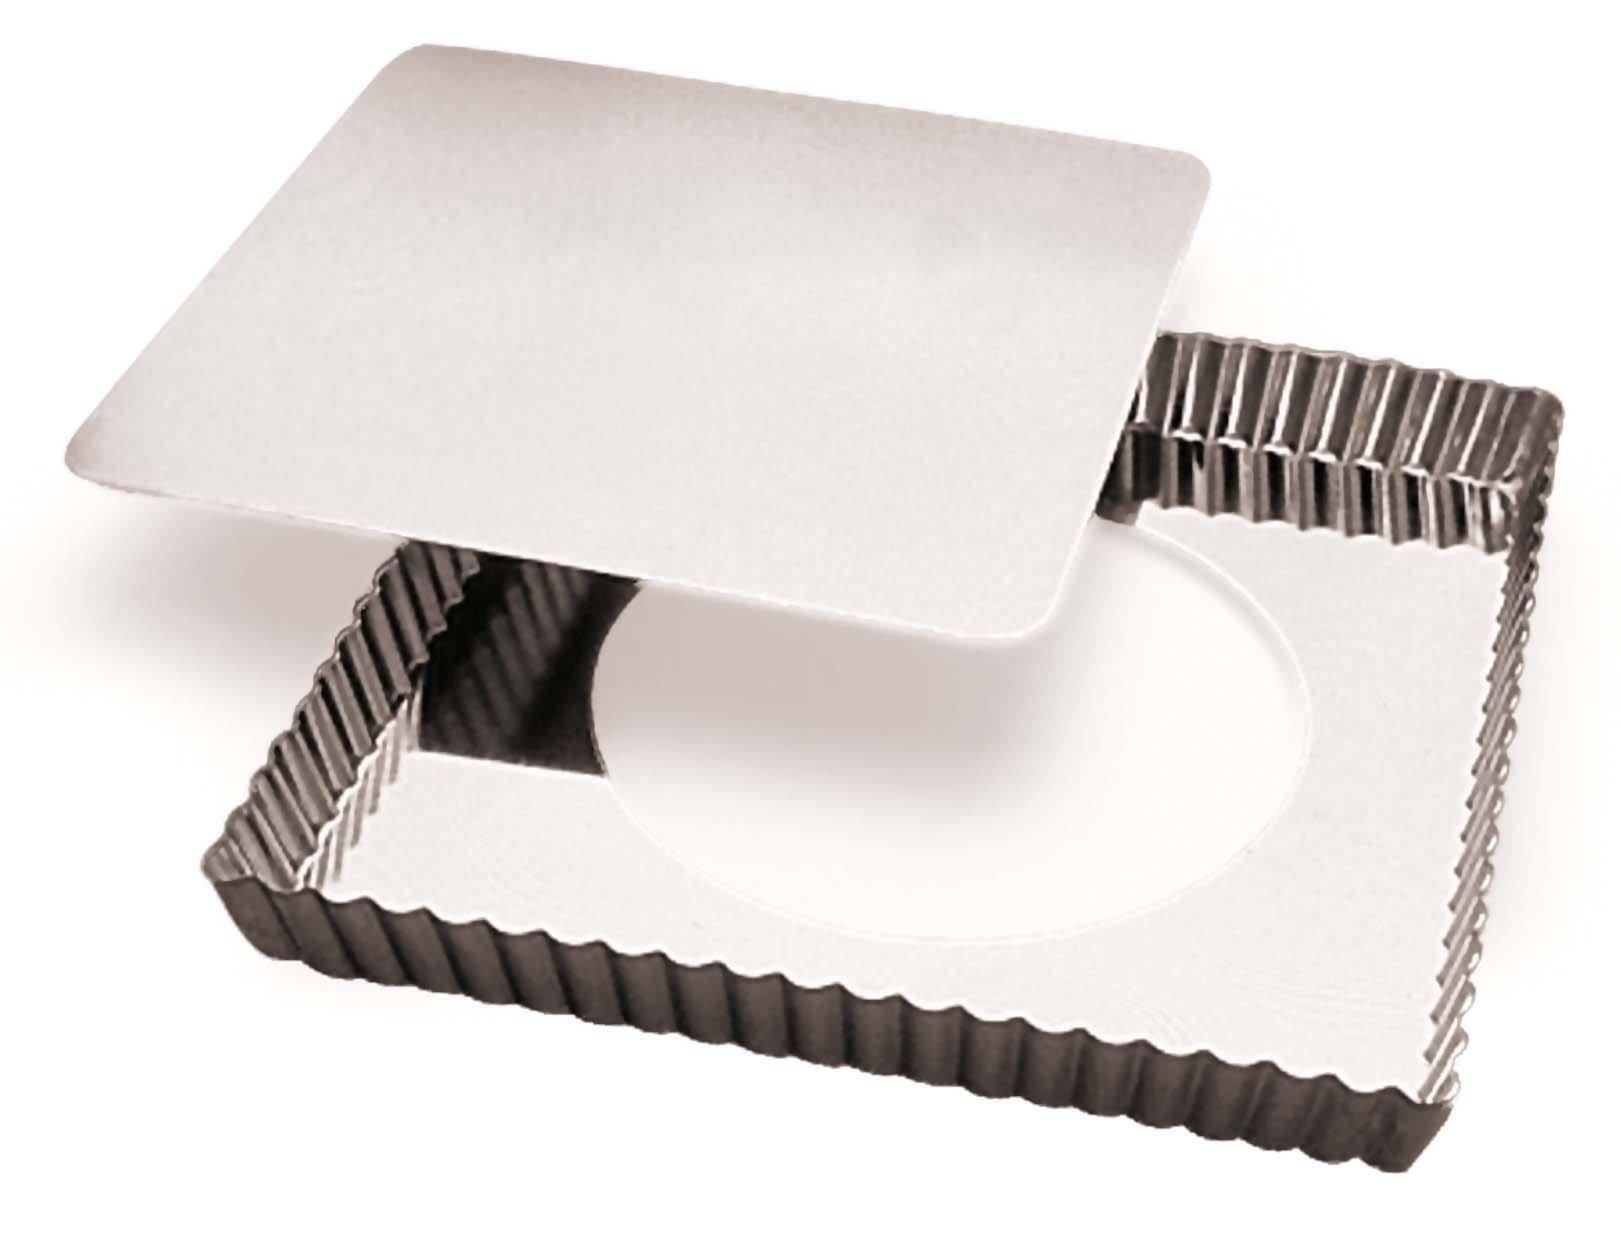 Paderno World Cuisine Square Tin Tart Pan, 9-Inch by Paderno World Cuisine